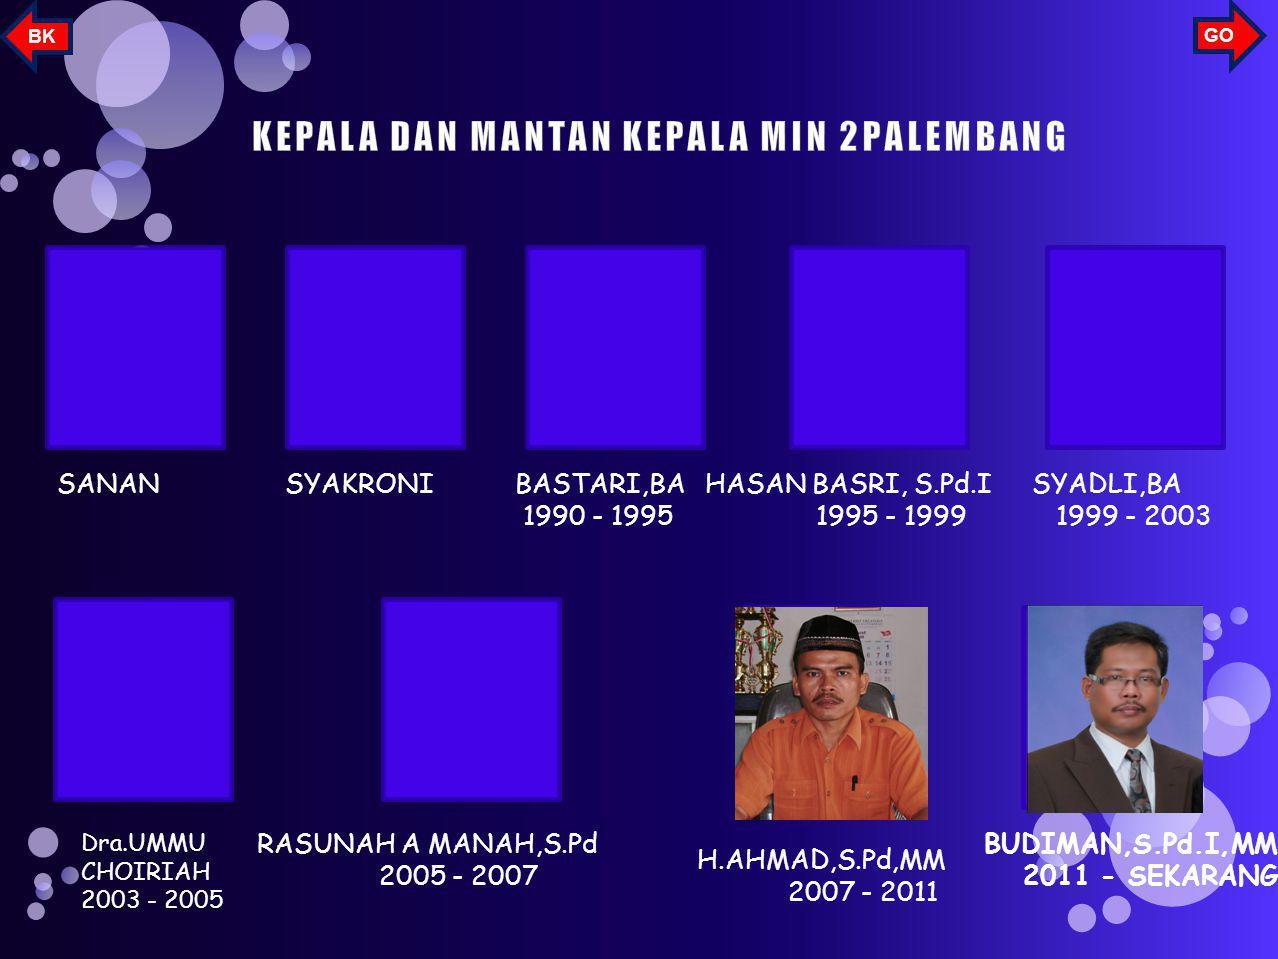 SANANSYAKRONIBASTARI,BA 1990 - 1995 HASAN BASRI, S.Pd.I 1995 - 1999 SYADLI,BA 1999 - 2003 Dra.UMMU CHOIRIAH 2003 - 2005 RASUNAH A MANAH,S.Pd 2005 - 2007 H.AHMAD,S.Pd,MM 2007 - 2011 BUDIMAN,S.Pd.I,MM.Pd 2011 - SEKARANG GO BK